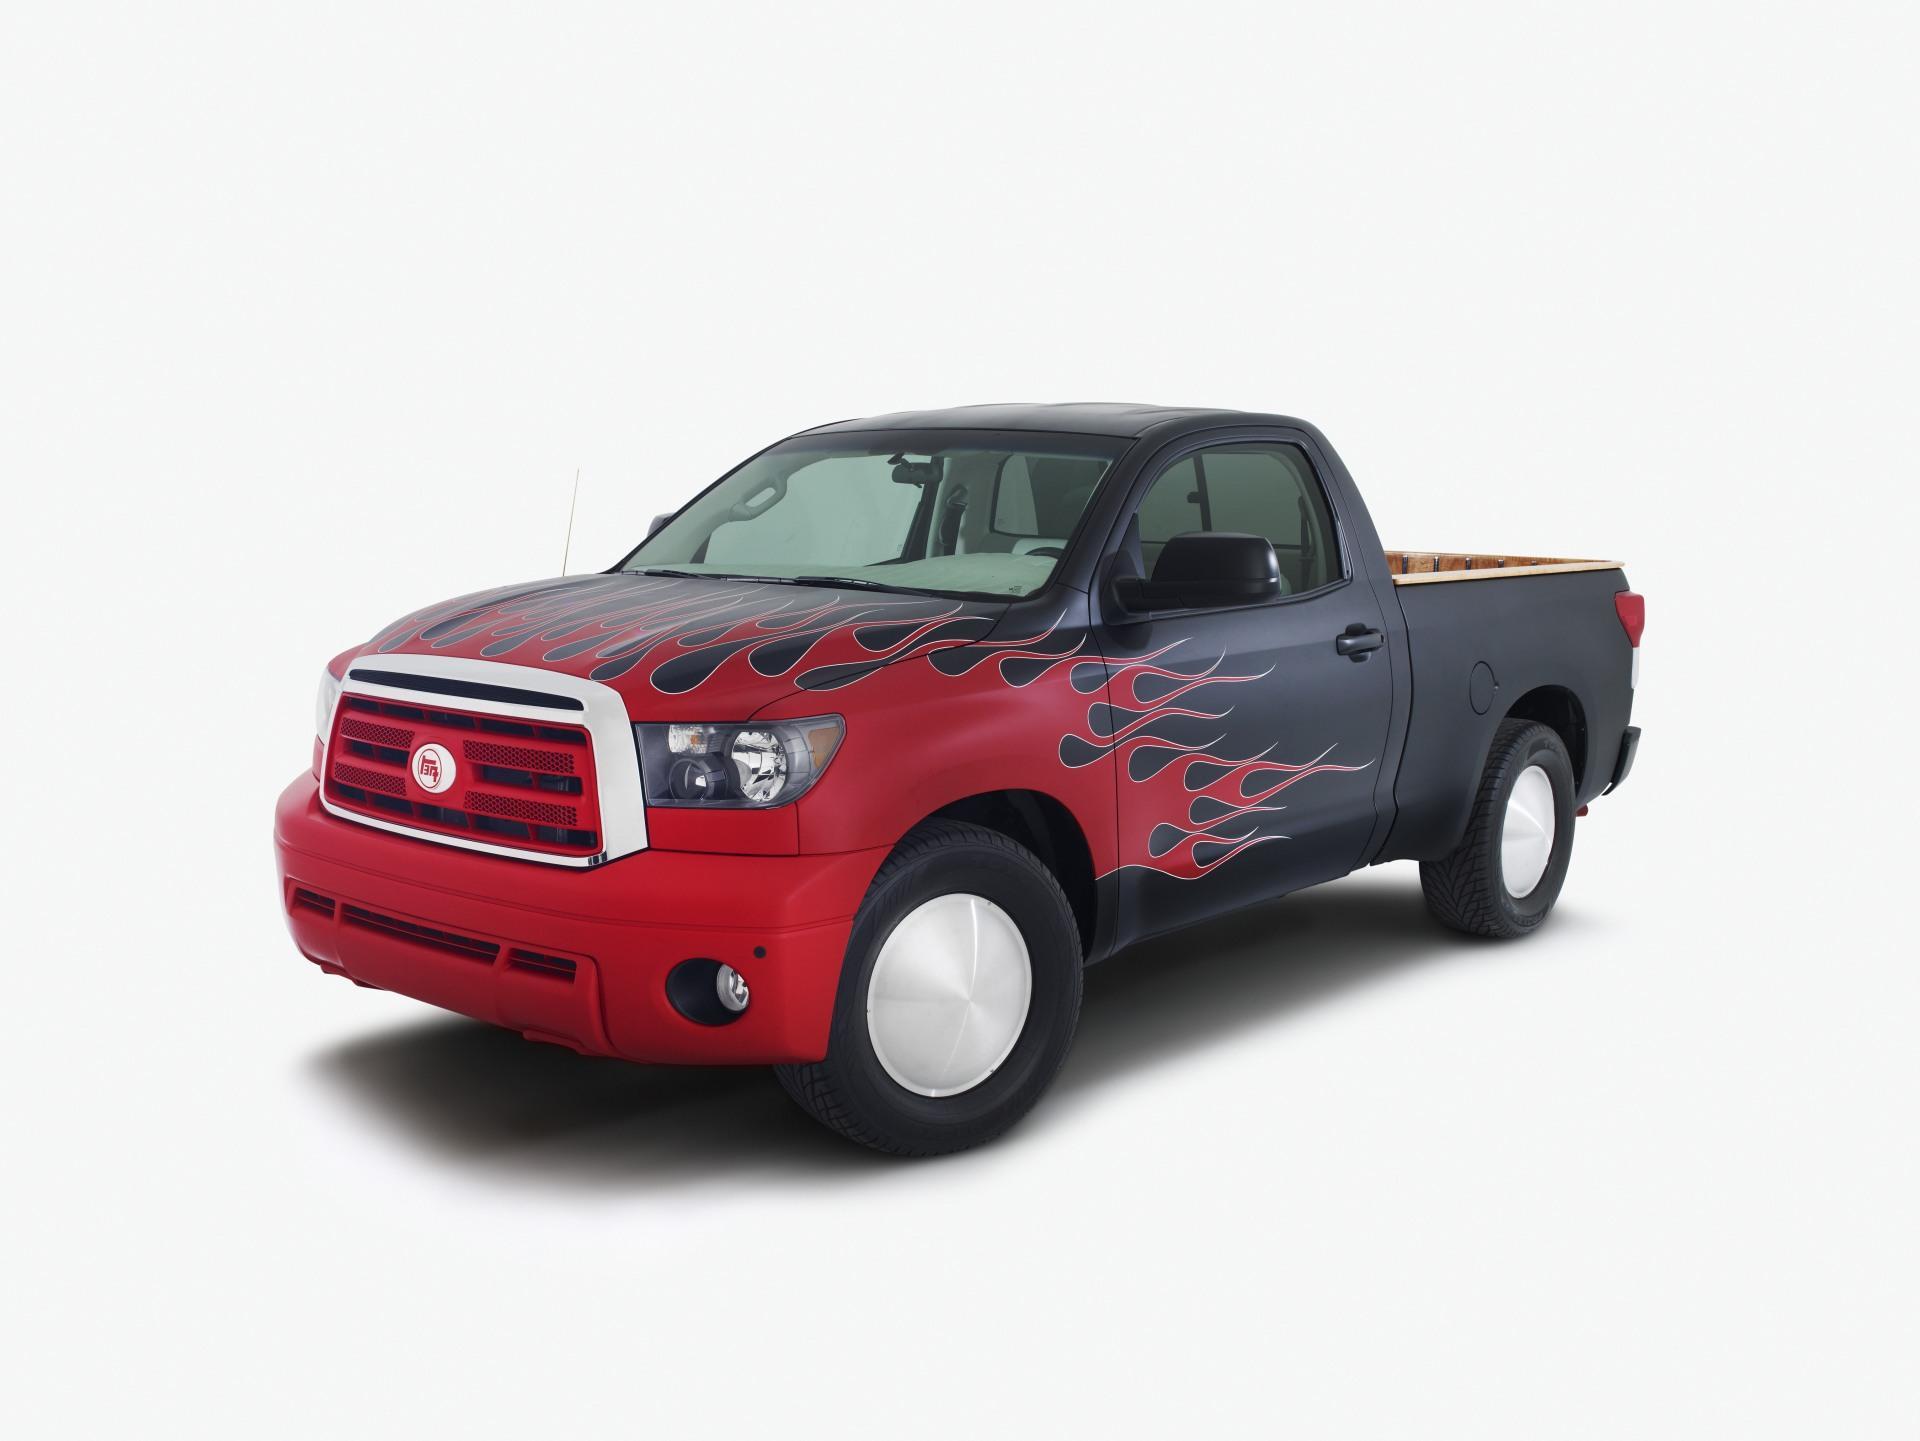 2009 Toyota Tundra Hot Rod News and Information